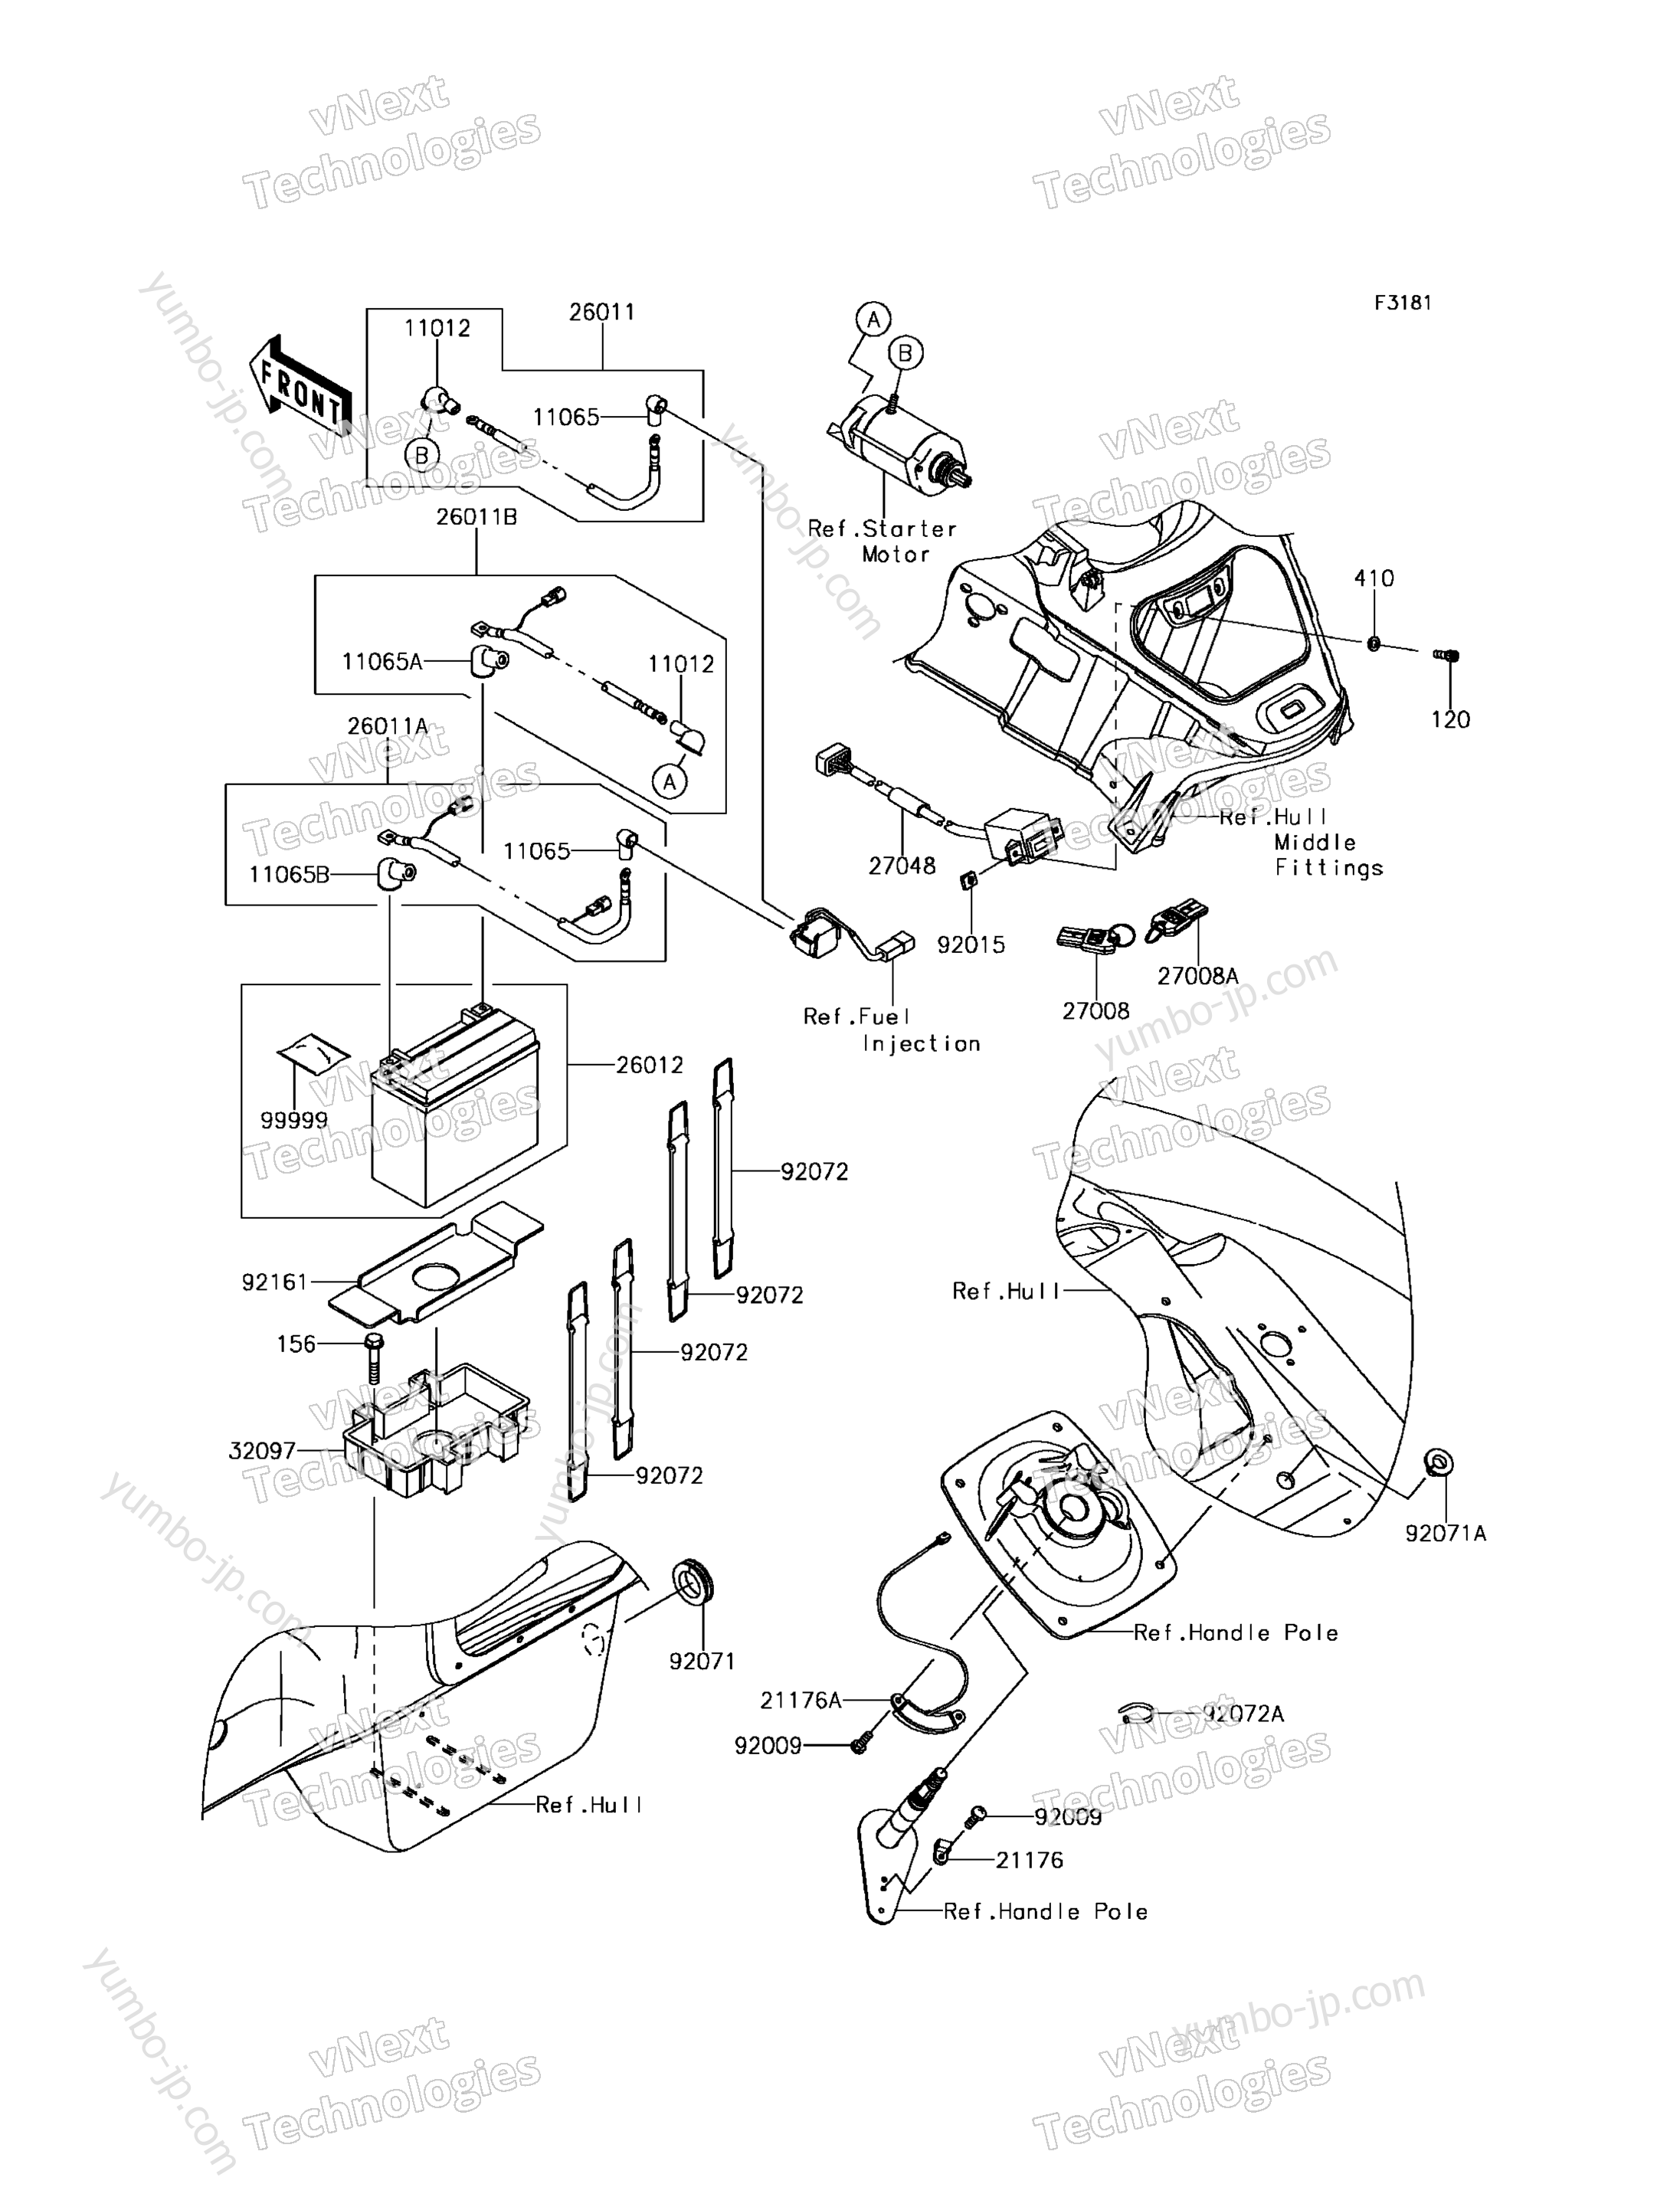 Electrical Equipment для гидроциклов KAWASAKI JET SKI ULTRA 310X (JT1500PHF) 2017 г.